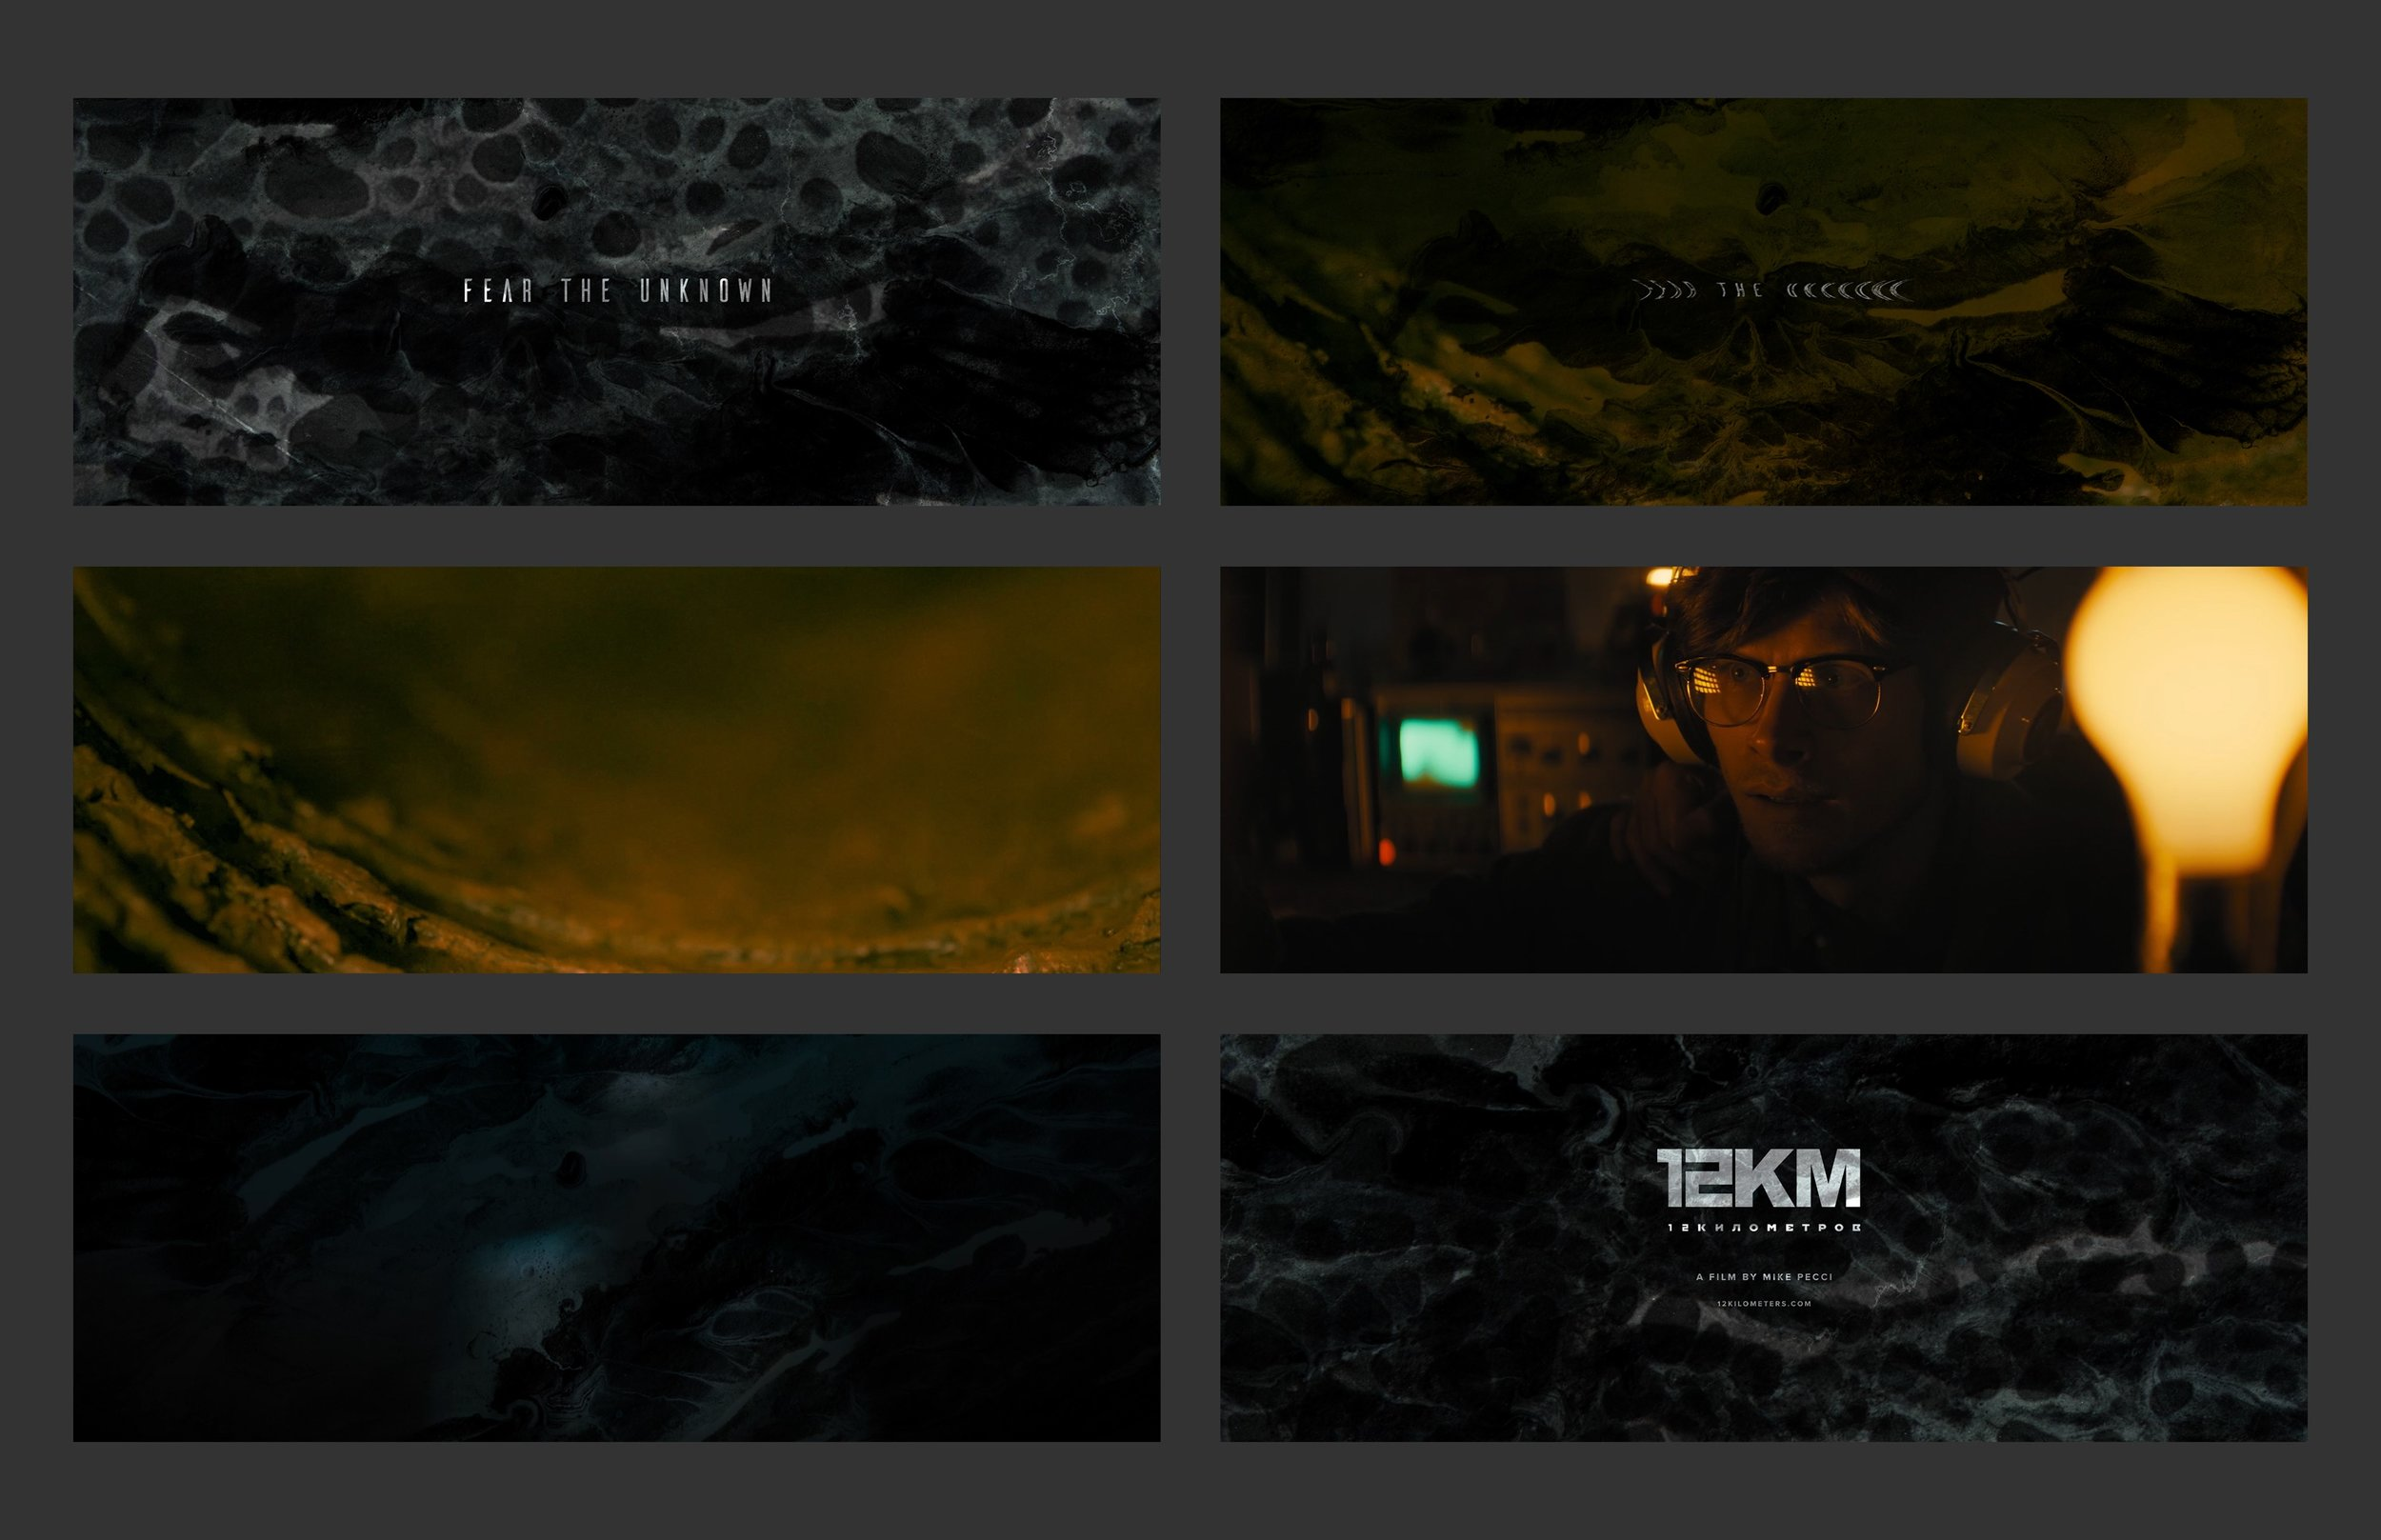 12 KILOMETERS – Film Trailer, Footage Courtesy of Mike Pecci